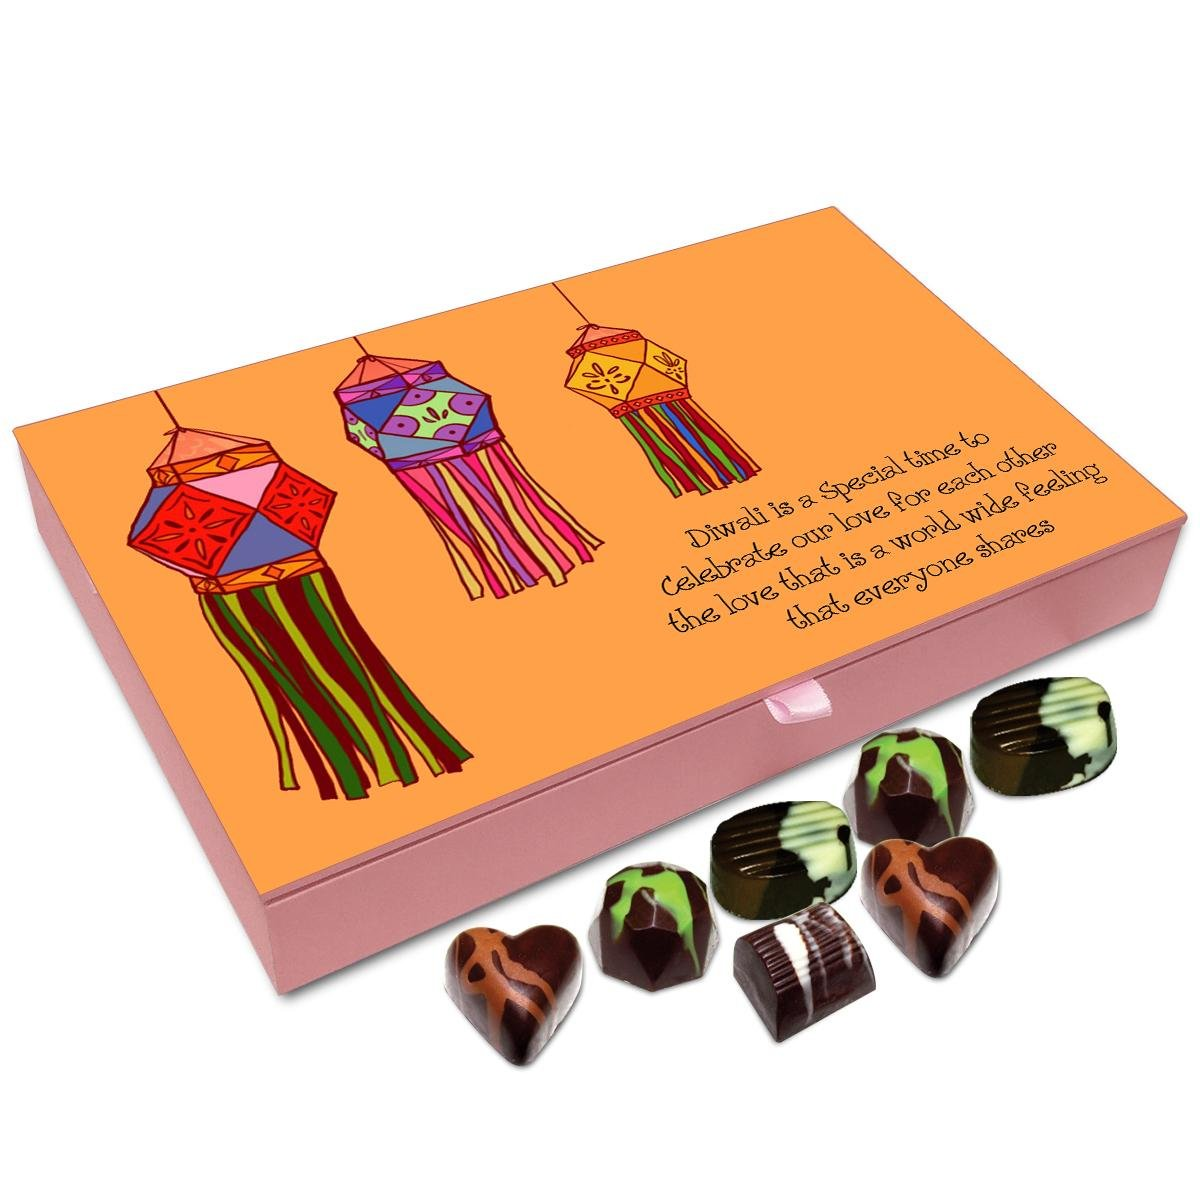 Chocholik Diwali Gift Box – Diwali is A Festival of Love Chocolate Box – 12pc